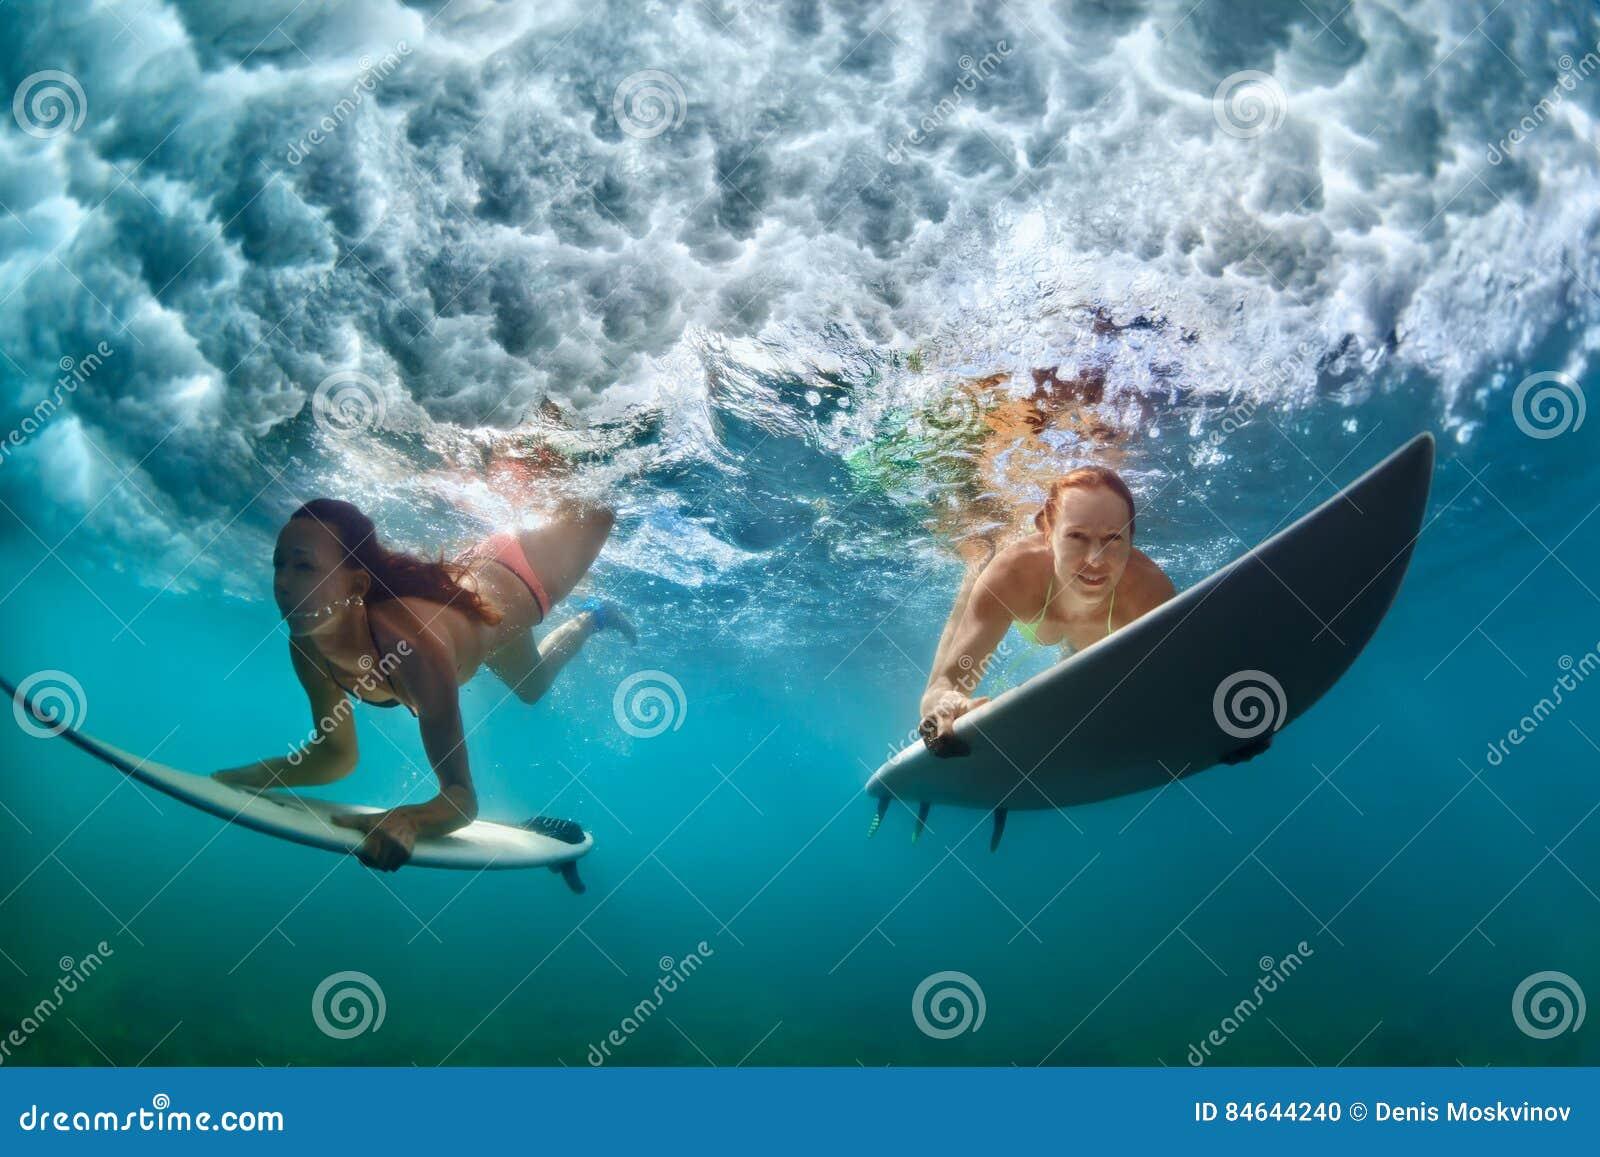 9c36409cfd Surfer women with surf board dive underwater under breaking big wave.  Healthy lifestyle. Water sport